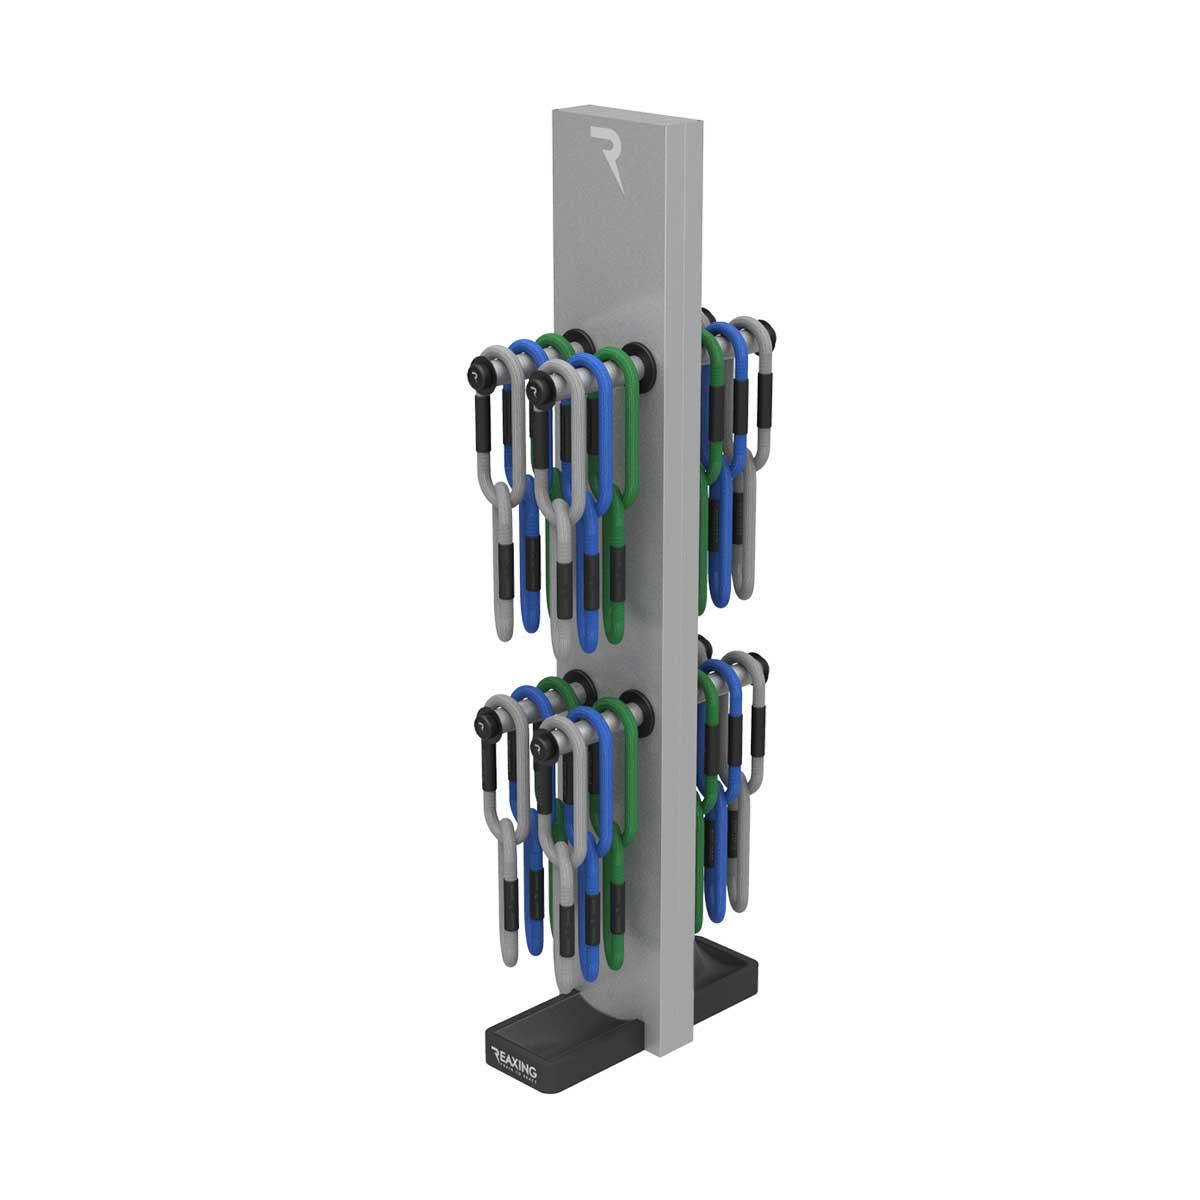 Reax Chain Two Vertical Storage